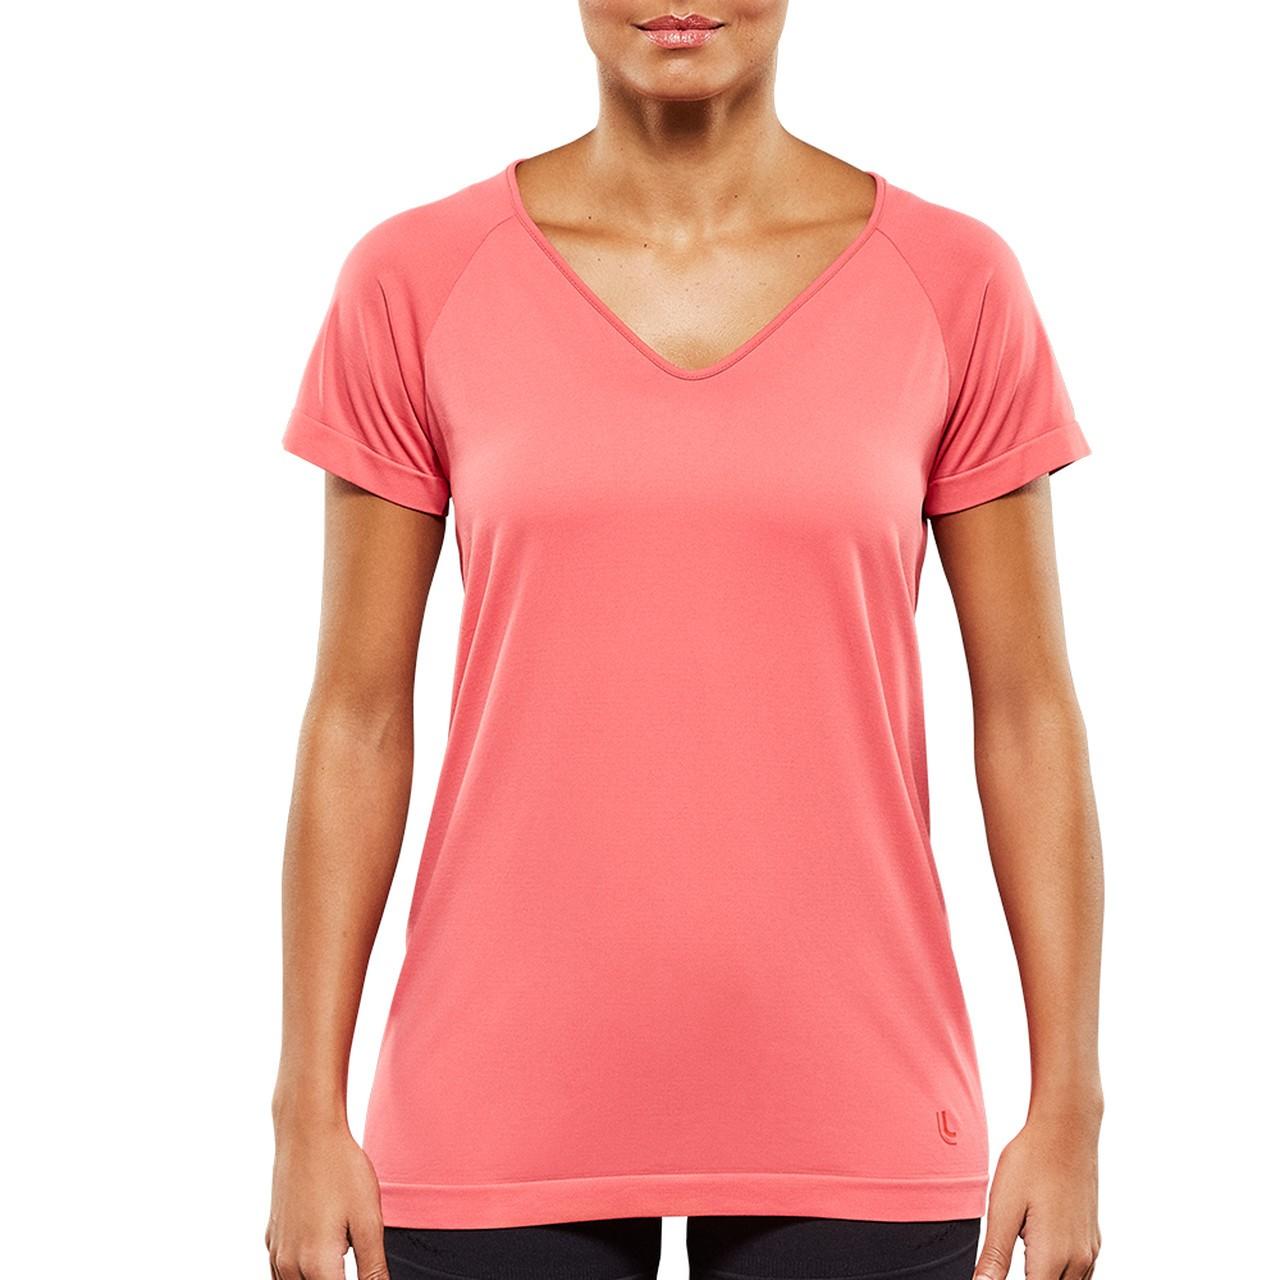 Camiseta feminina T-shirt antiviral comfortable fitness academia